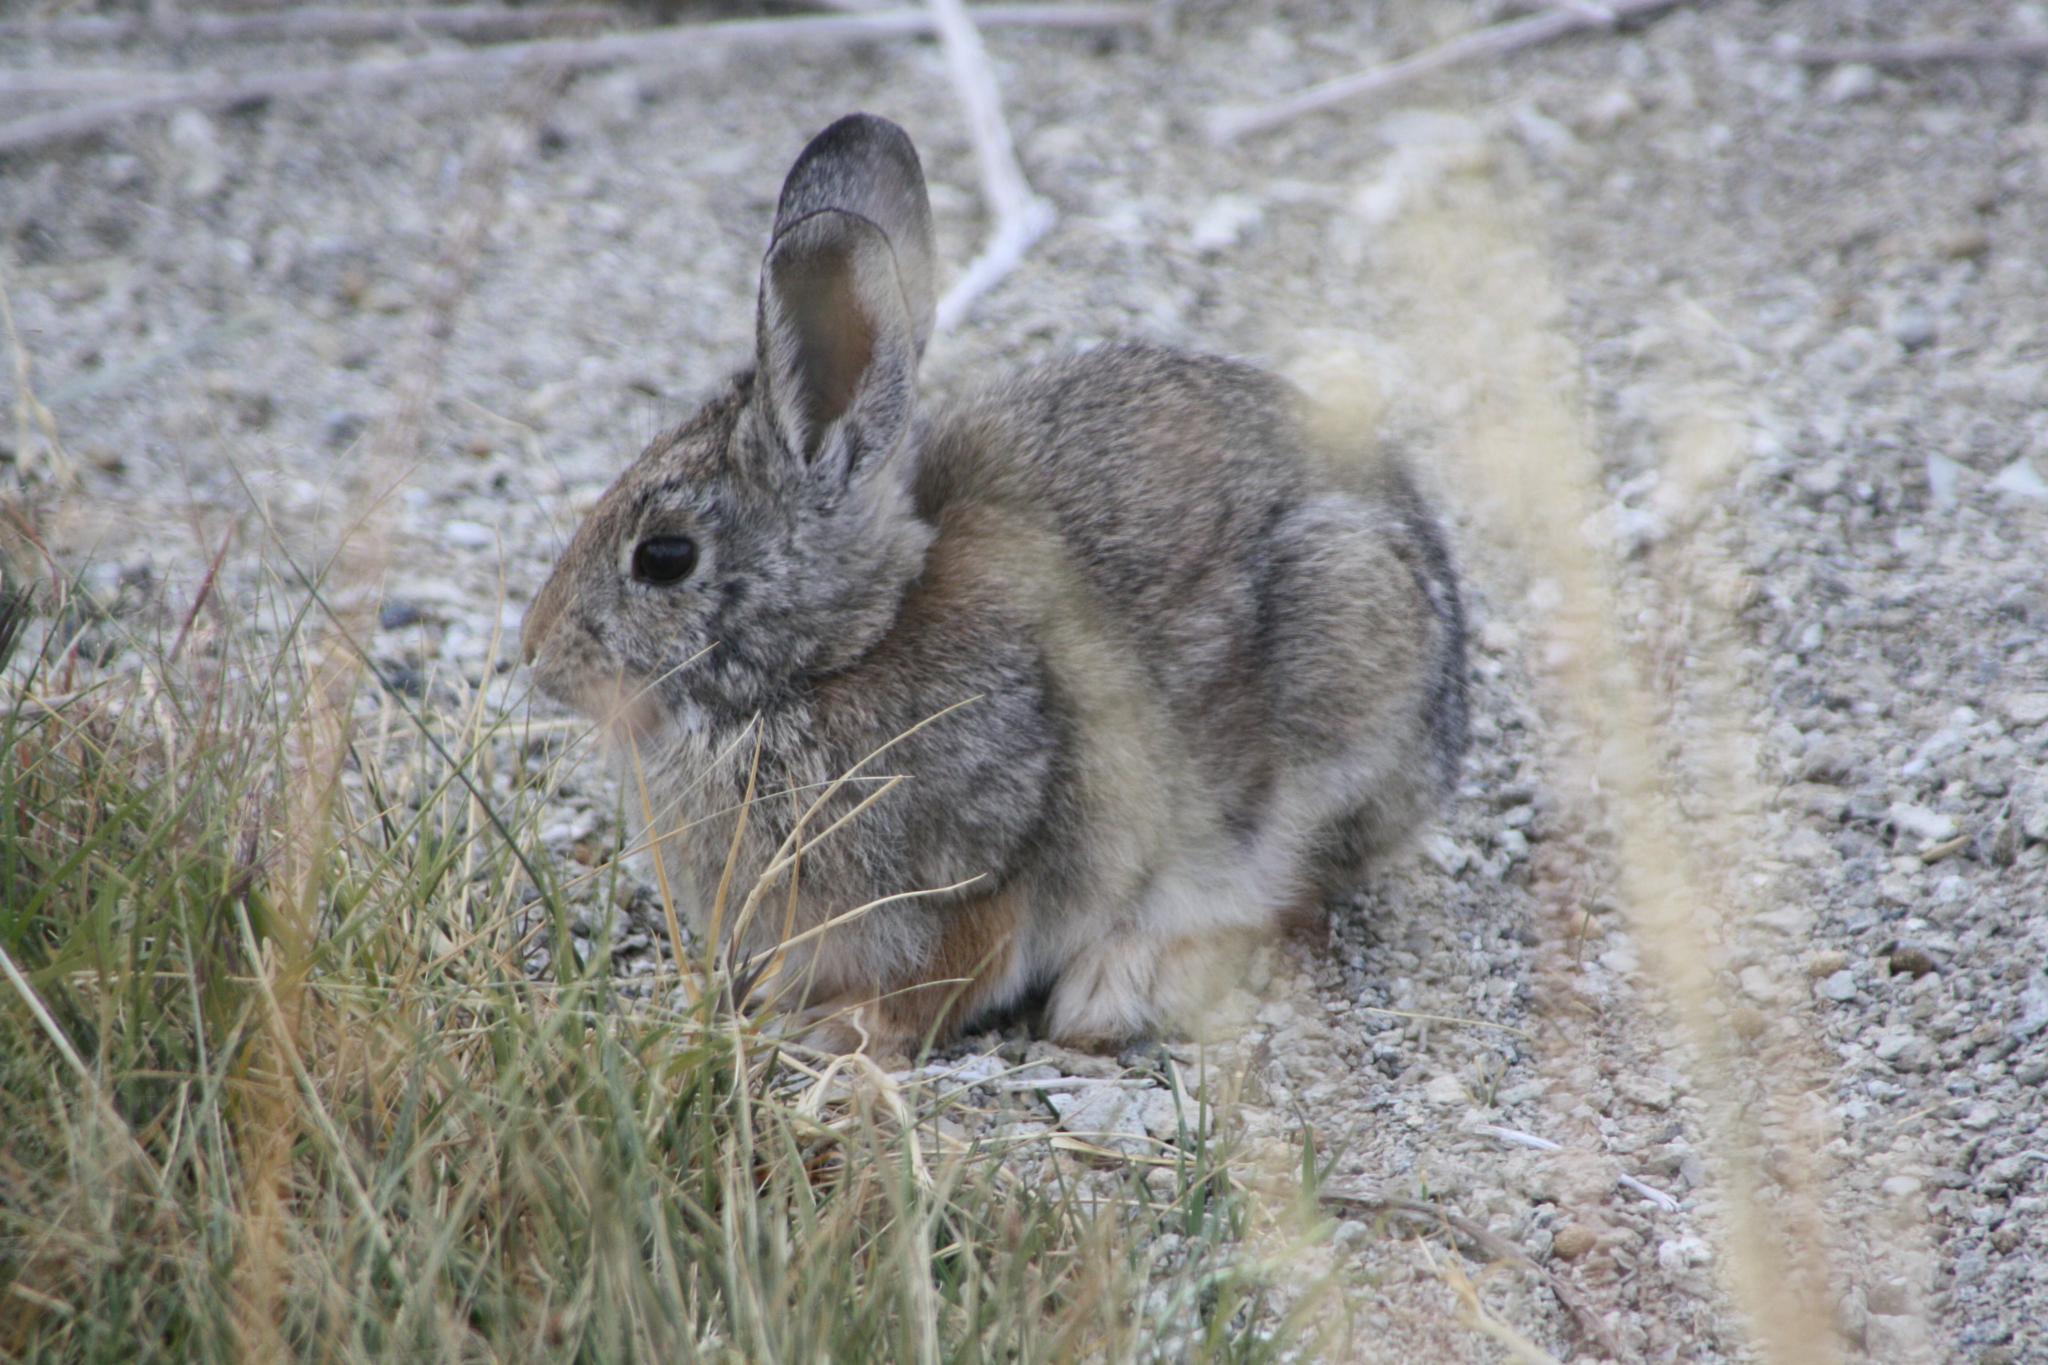 Rabbit by peyton0104